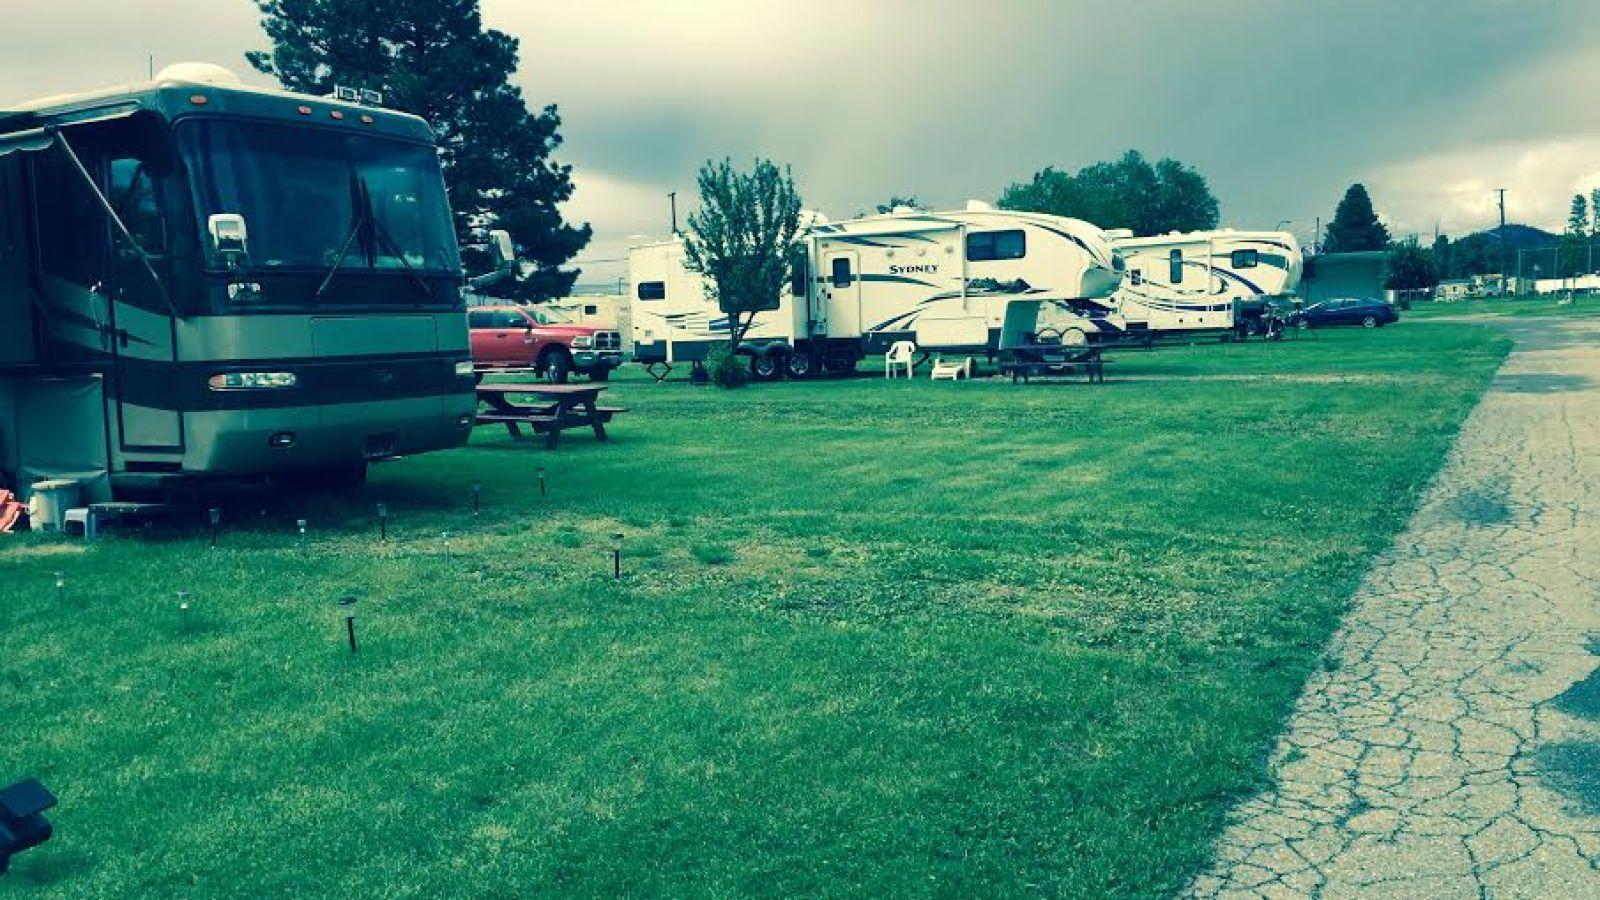 RV Resort and Campground.